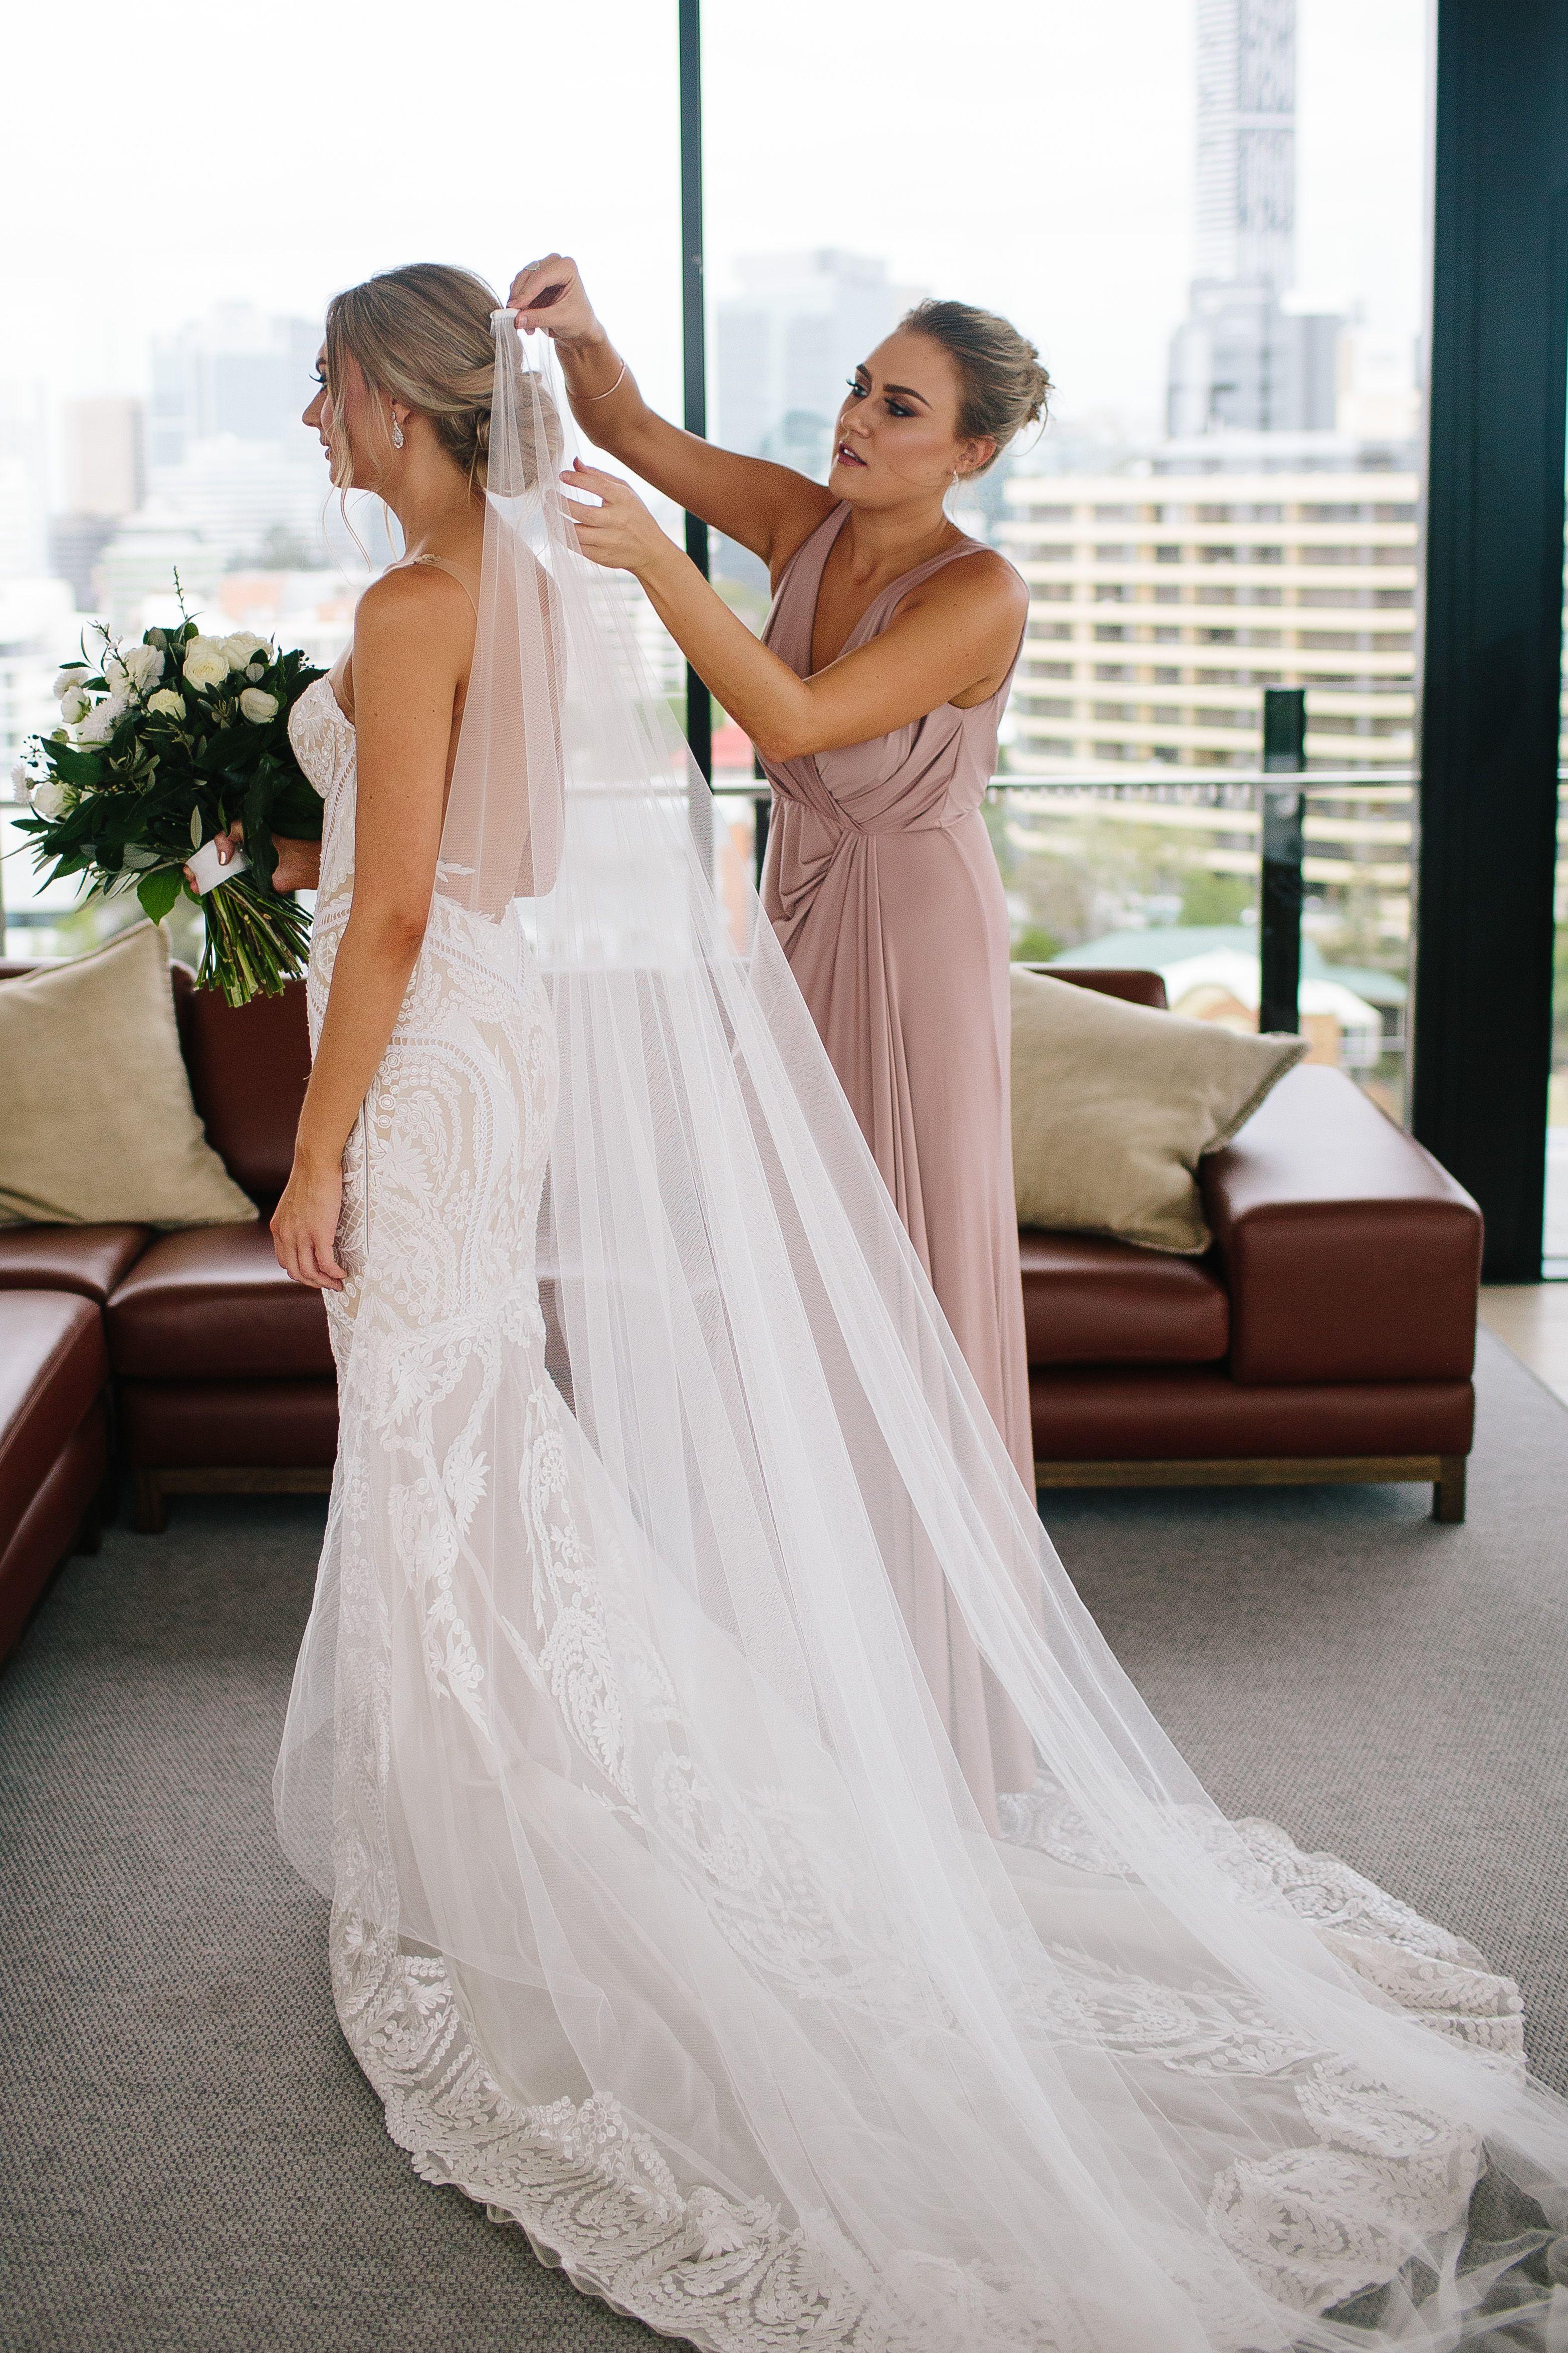 Rosy Latte Bridal Party | Bridal parties, Latte and Bridal dresses